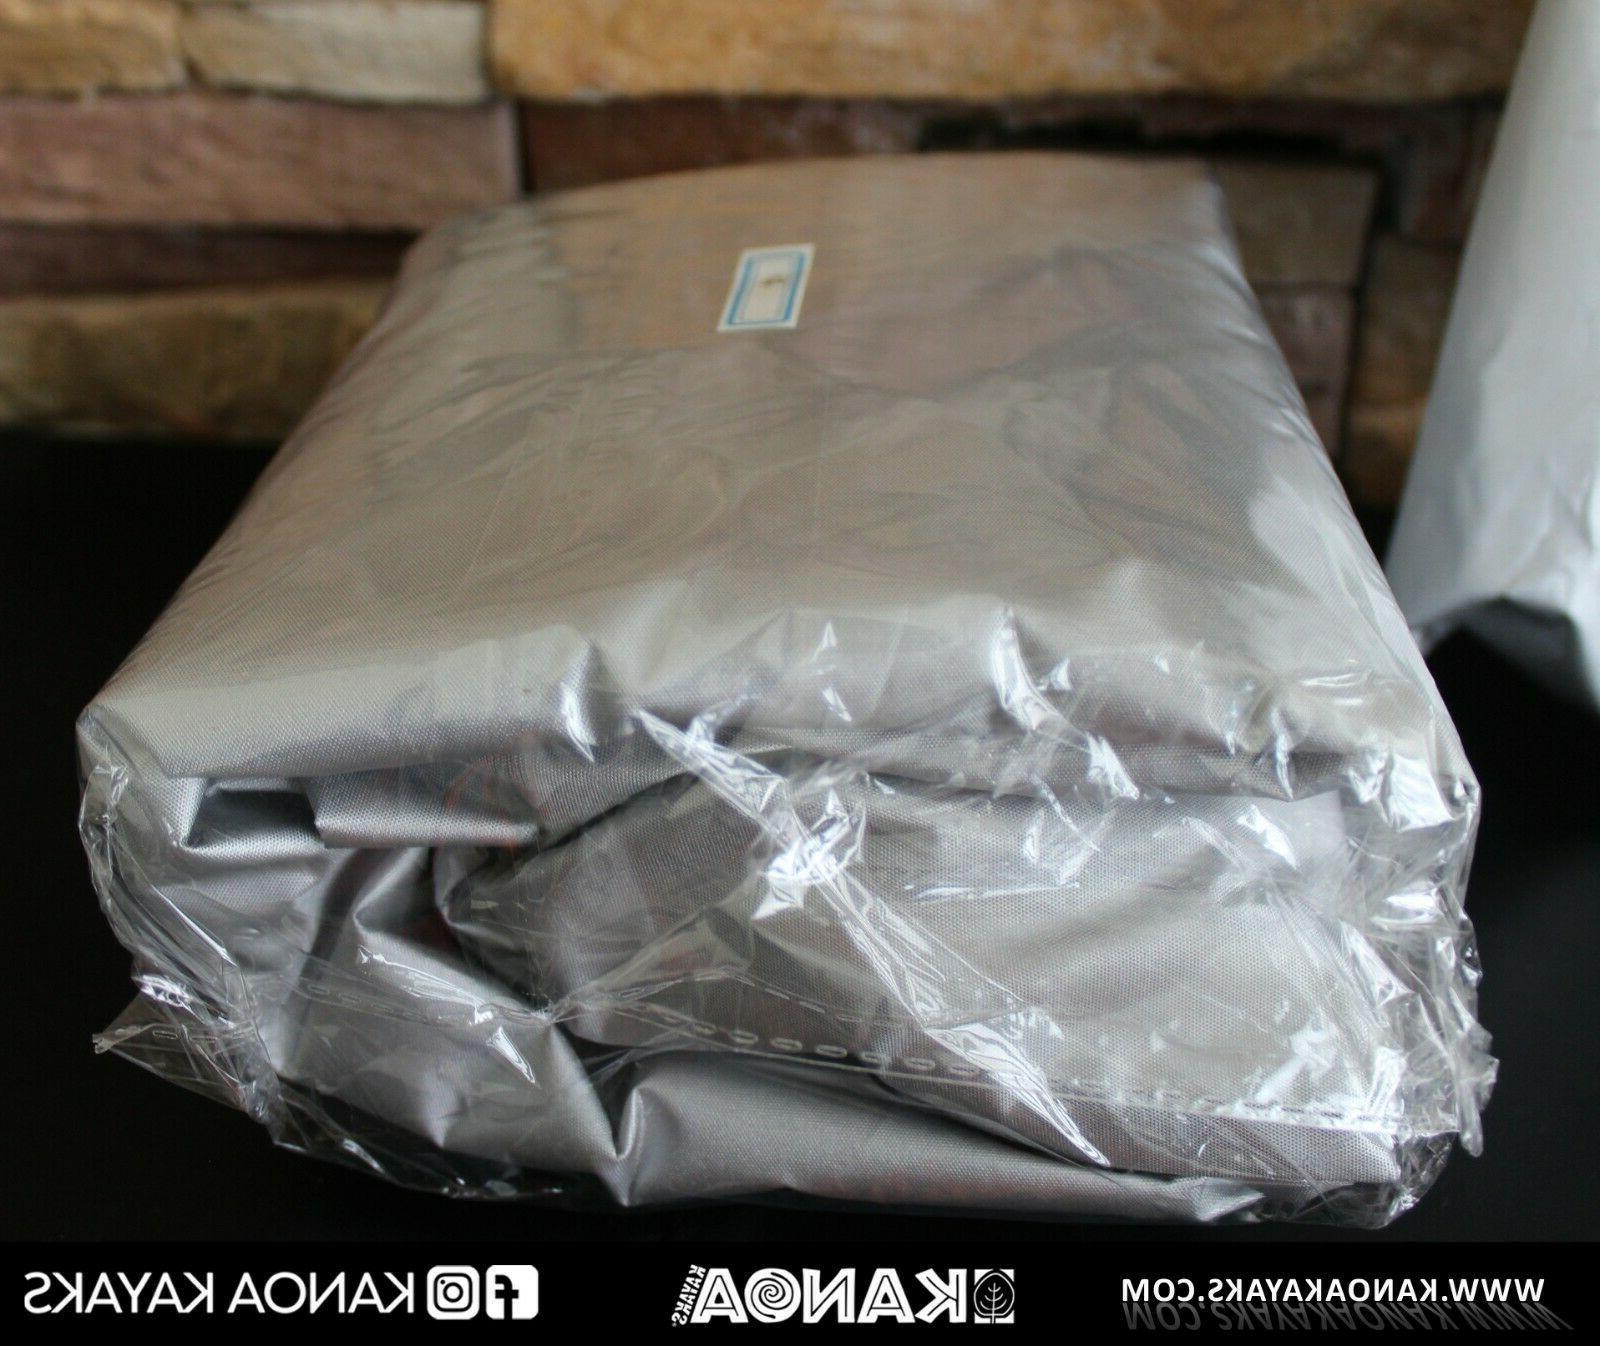 10'-11' KANOA kayak cover waterproof dust proof protector